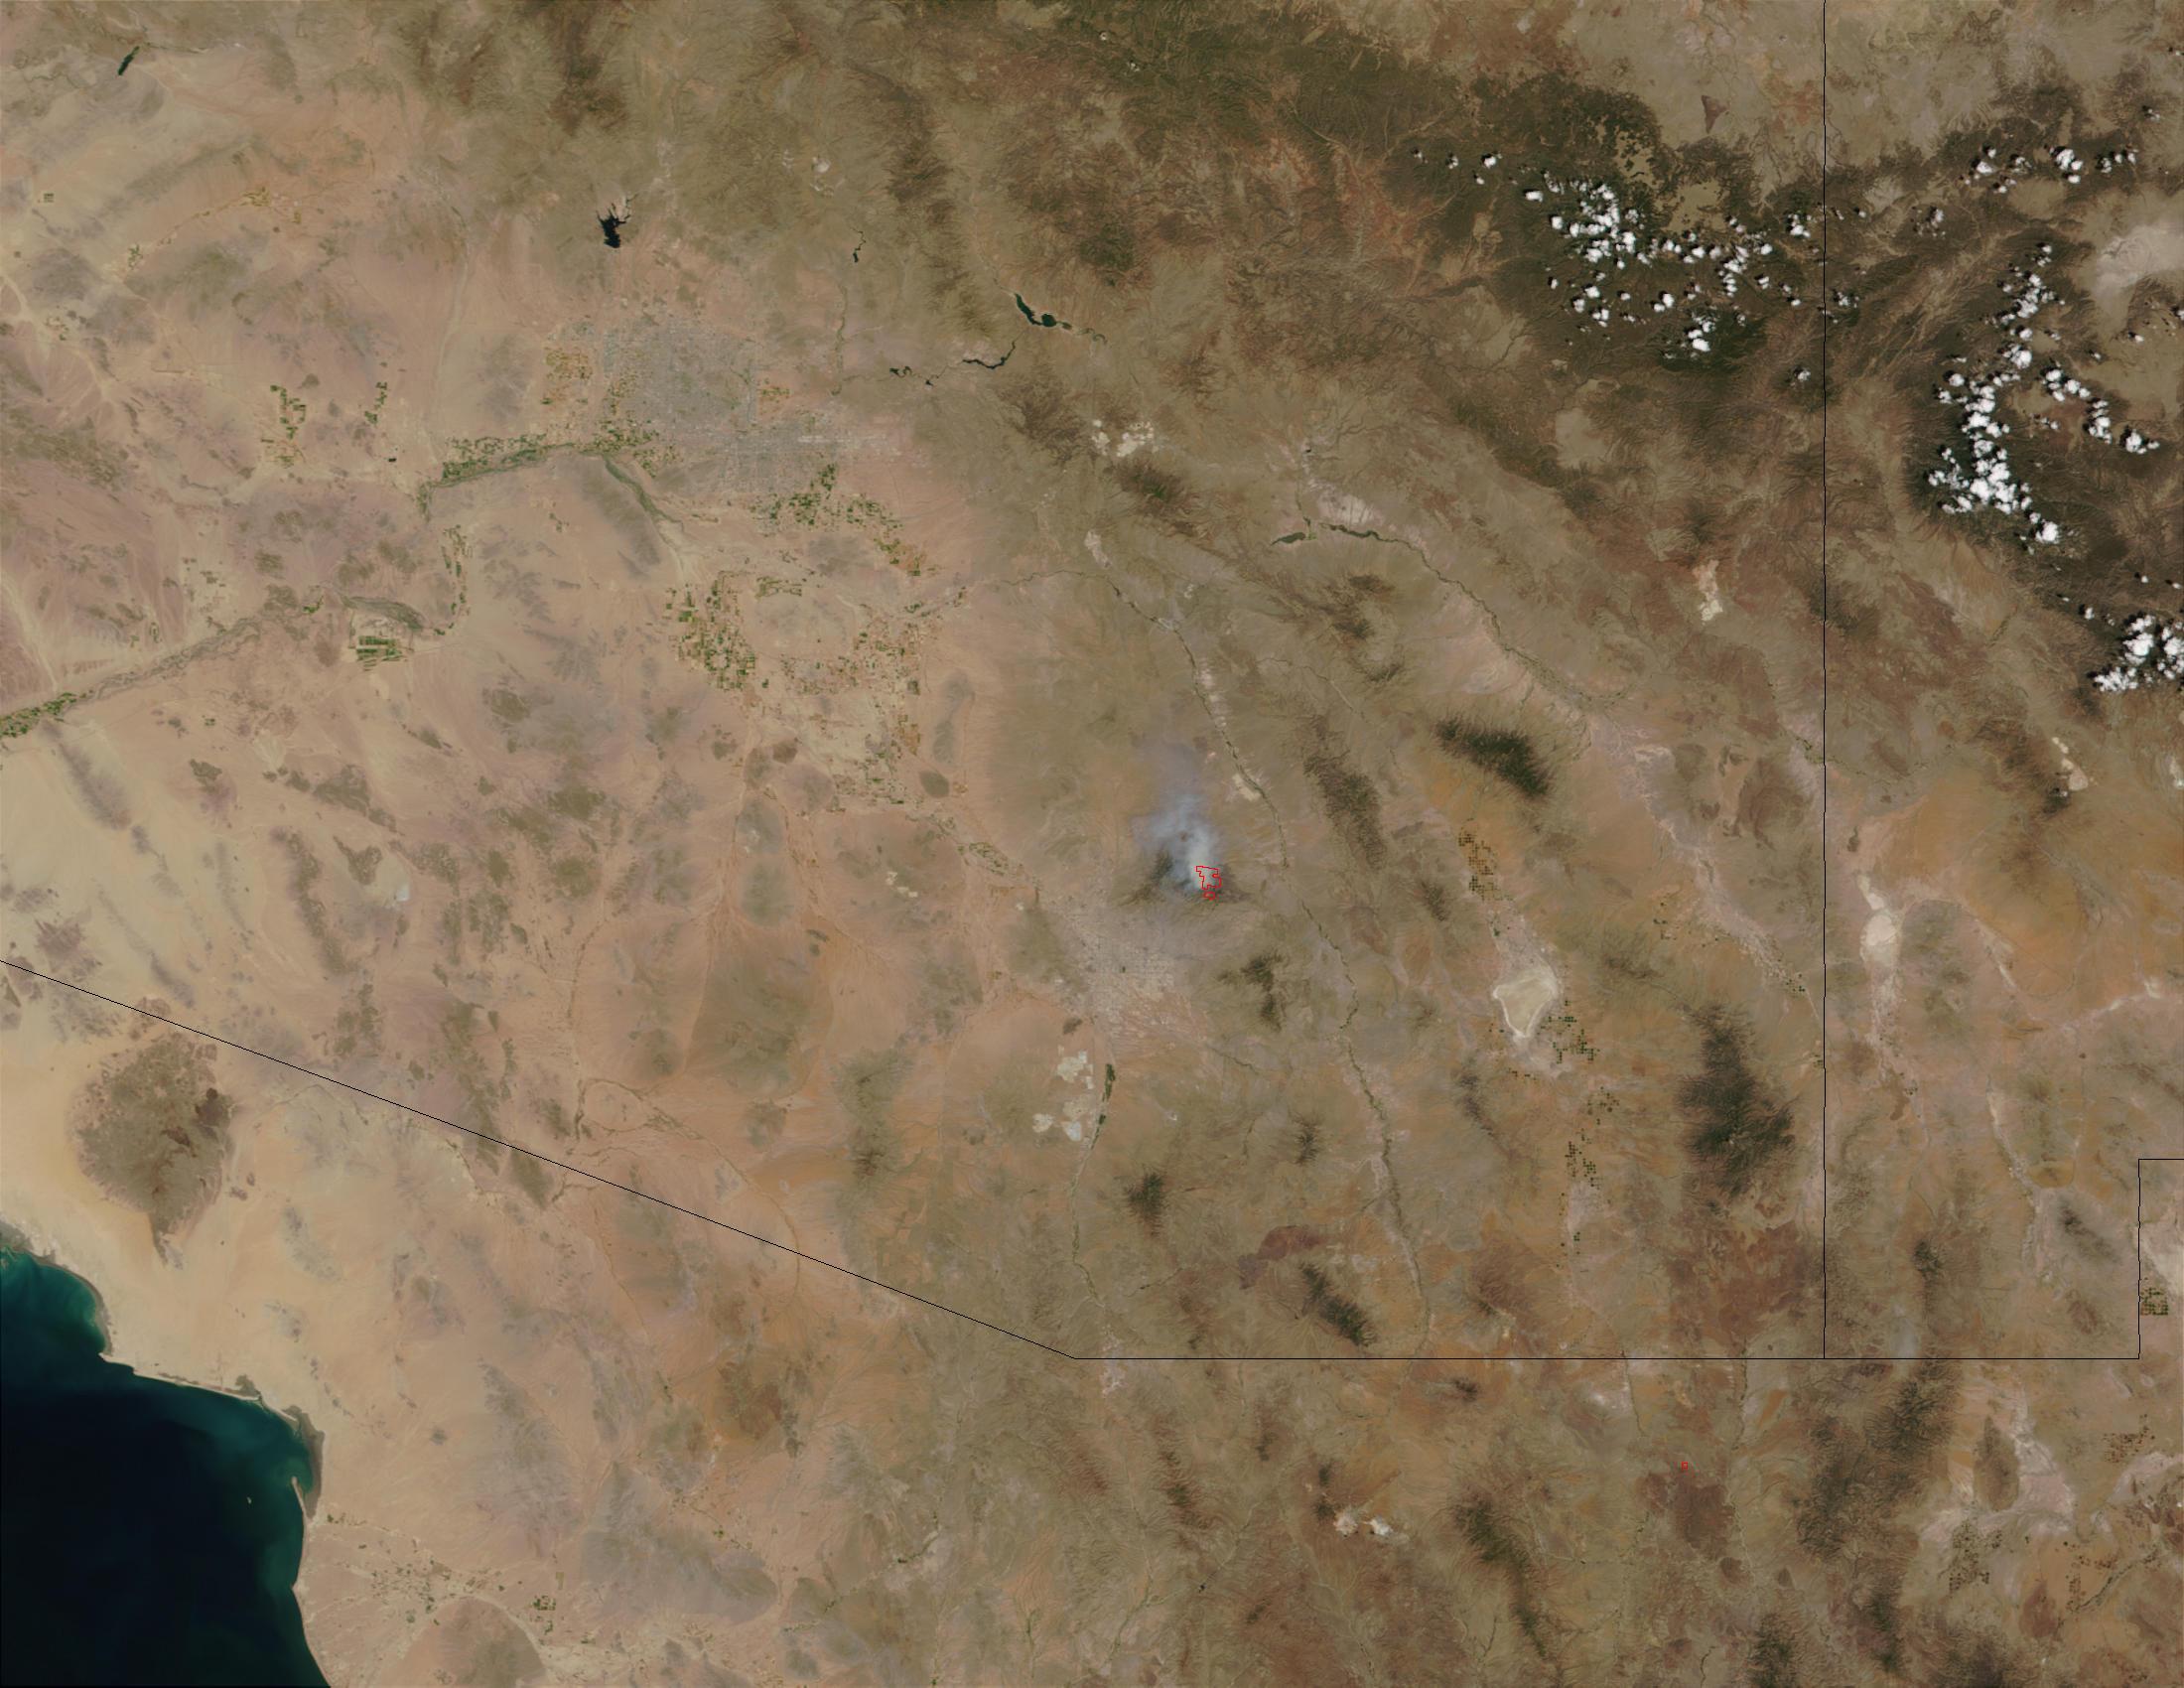 Bullock fire, Arizona